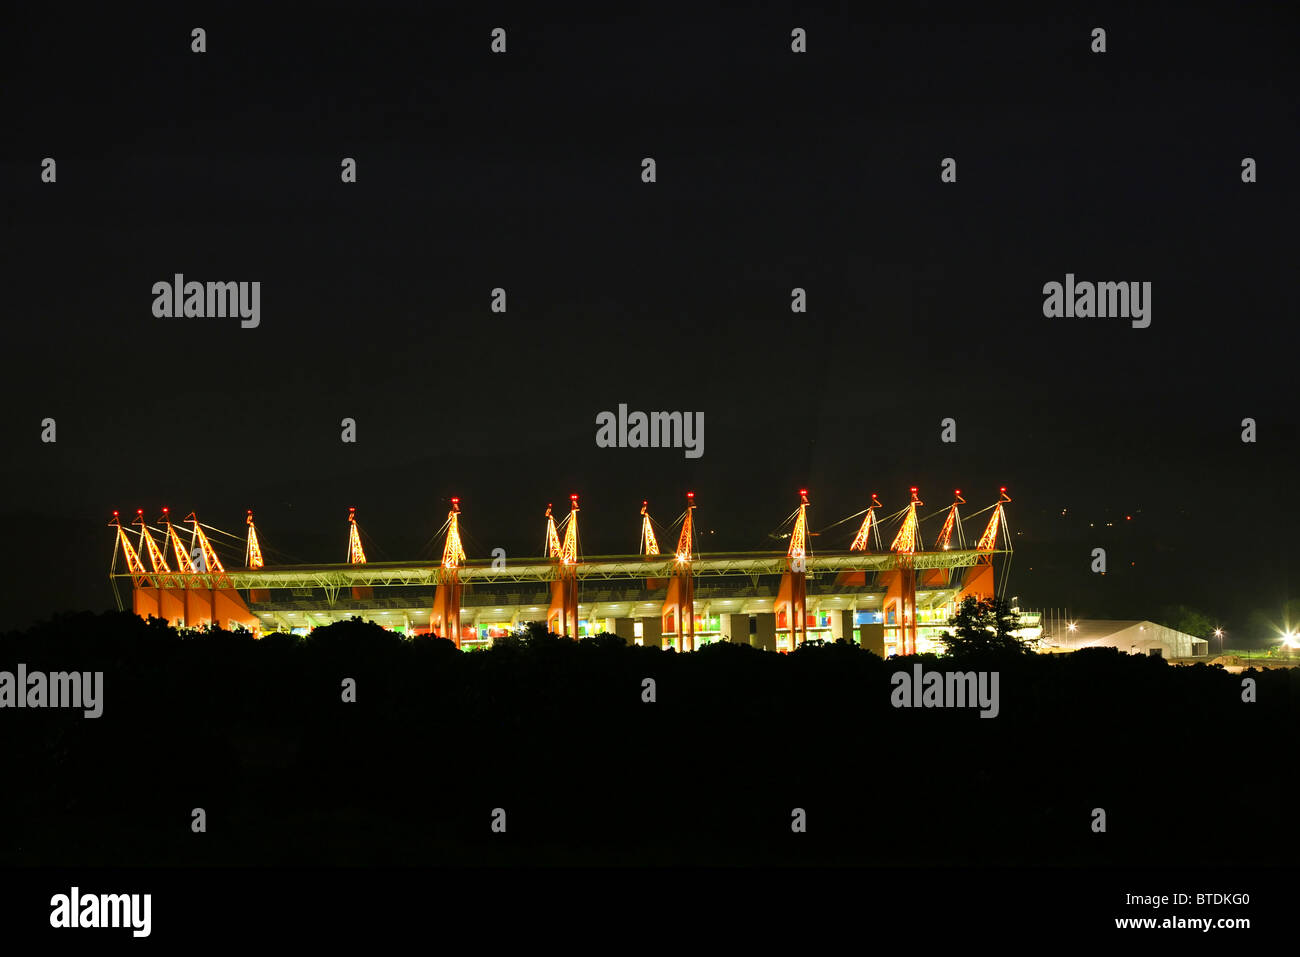 The 2010 FIFA World Cup Mbombela stadium viewed at night - Stock Image